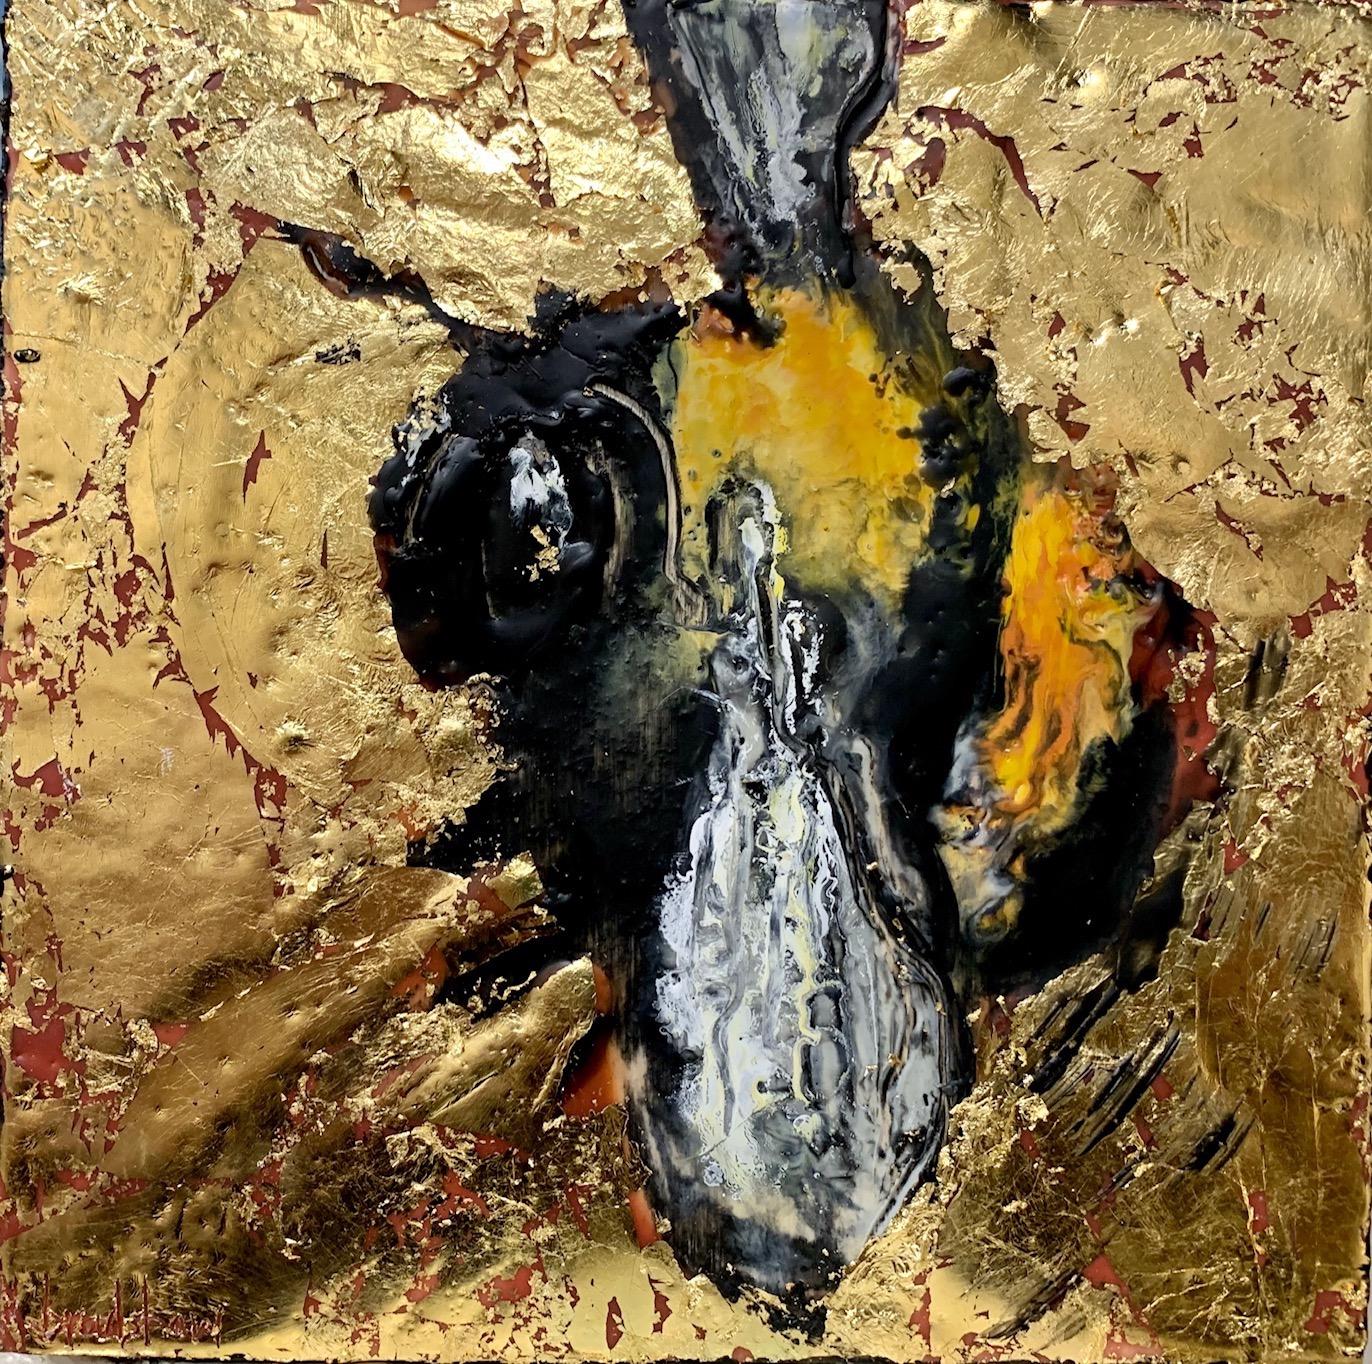 Lil' Gold by  Kathy Bradshaw - Masterpiece Online